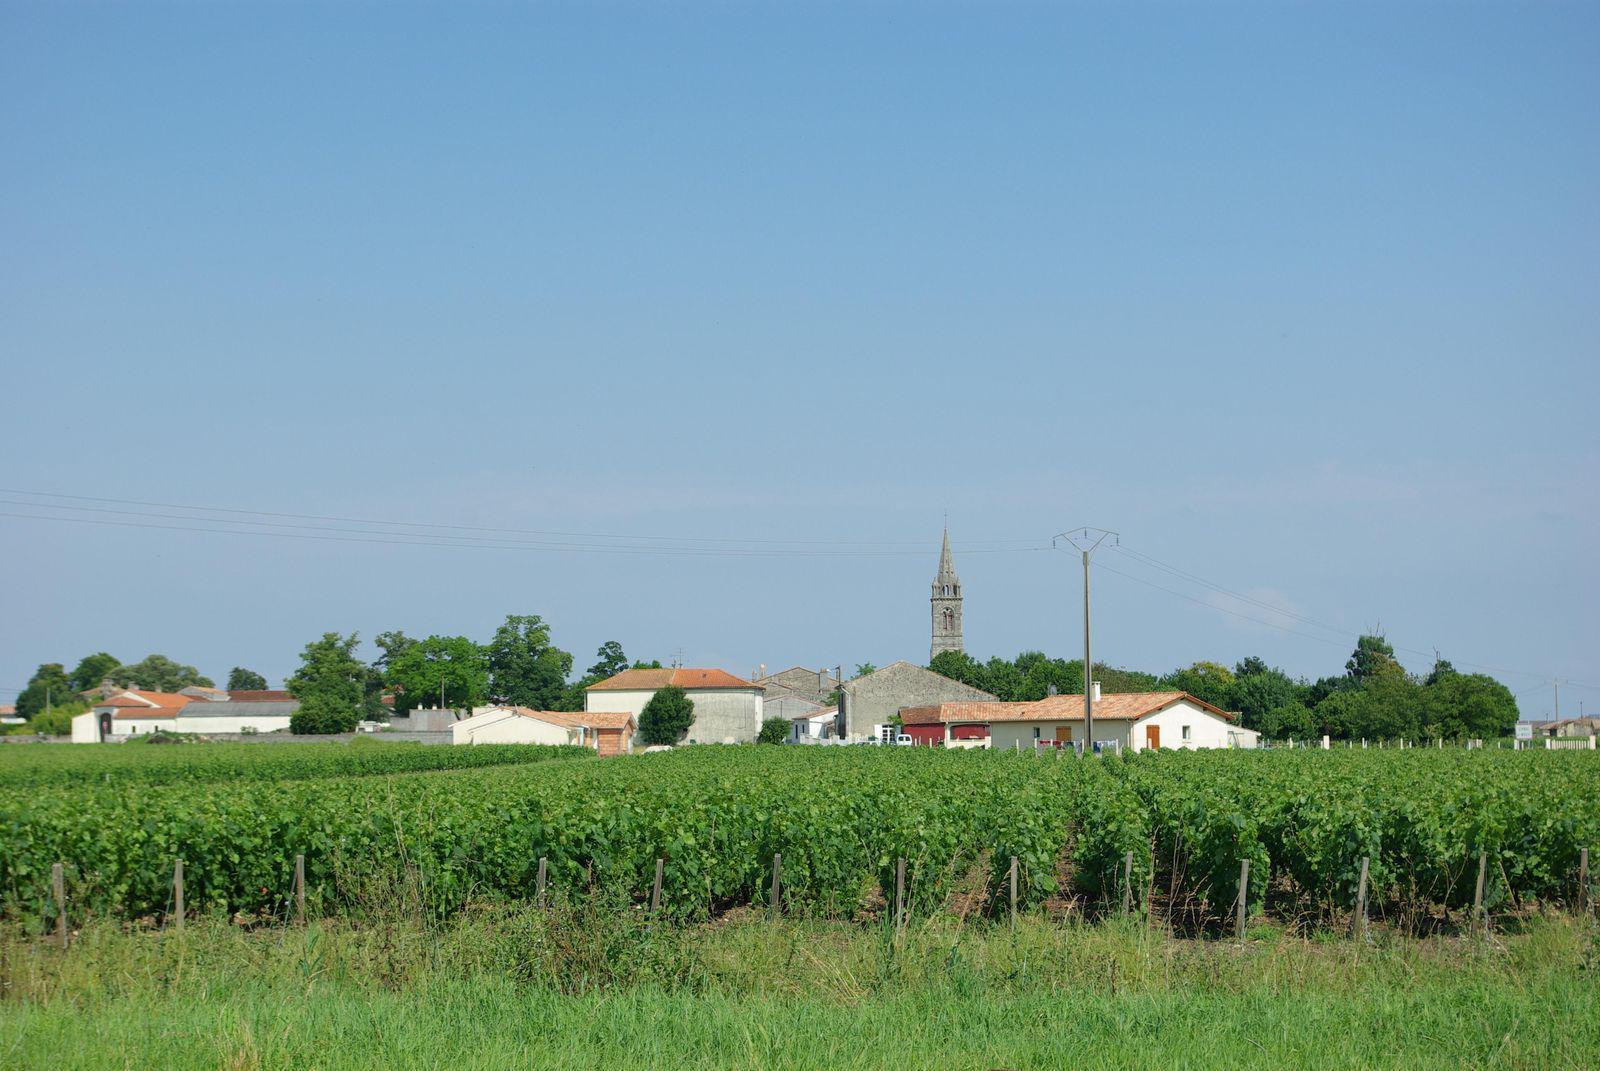 Image : Civrac-de-blaye